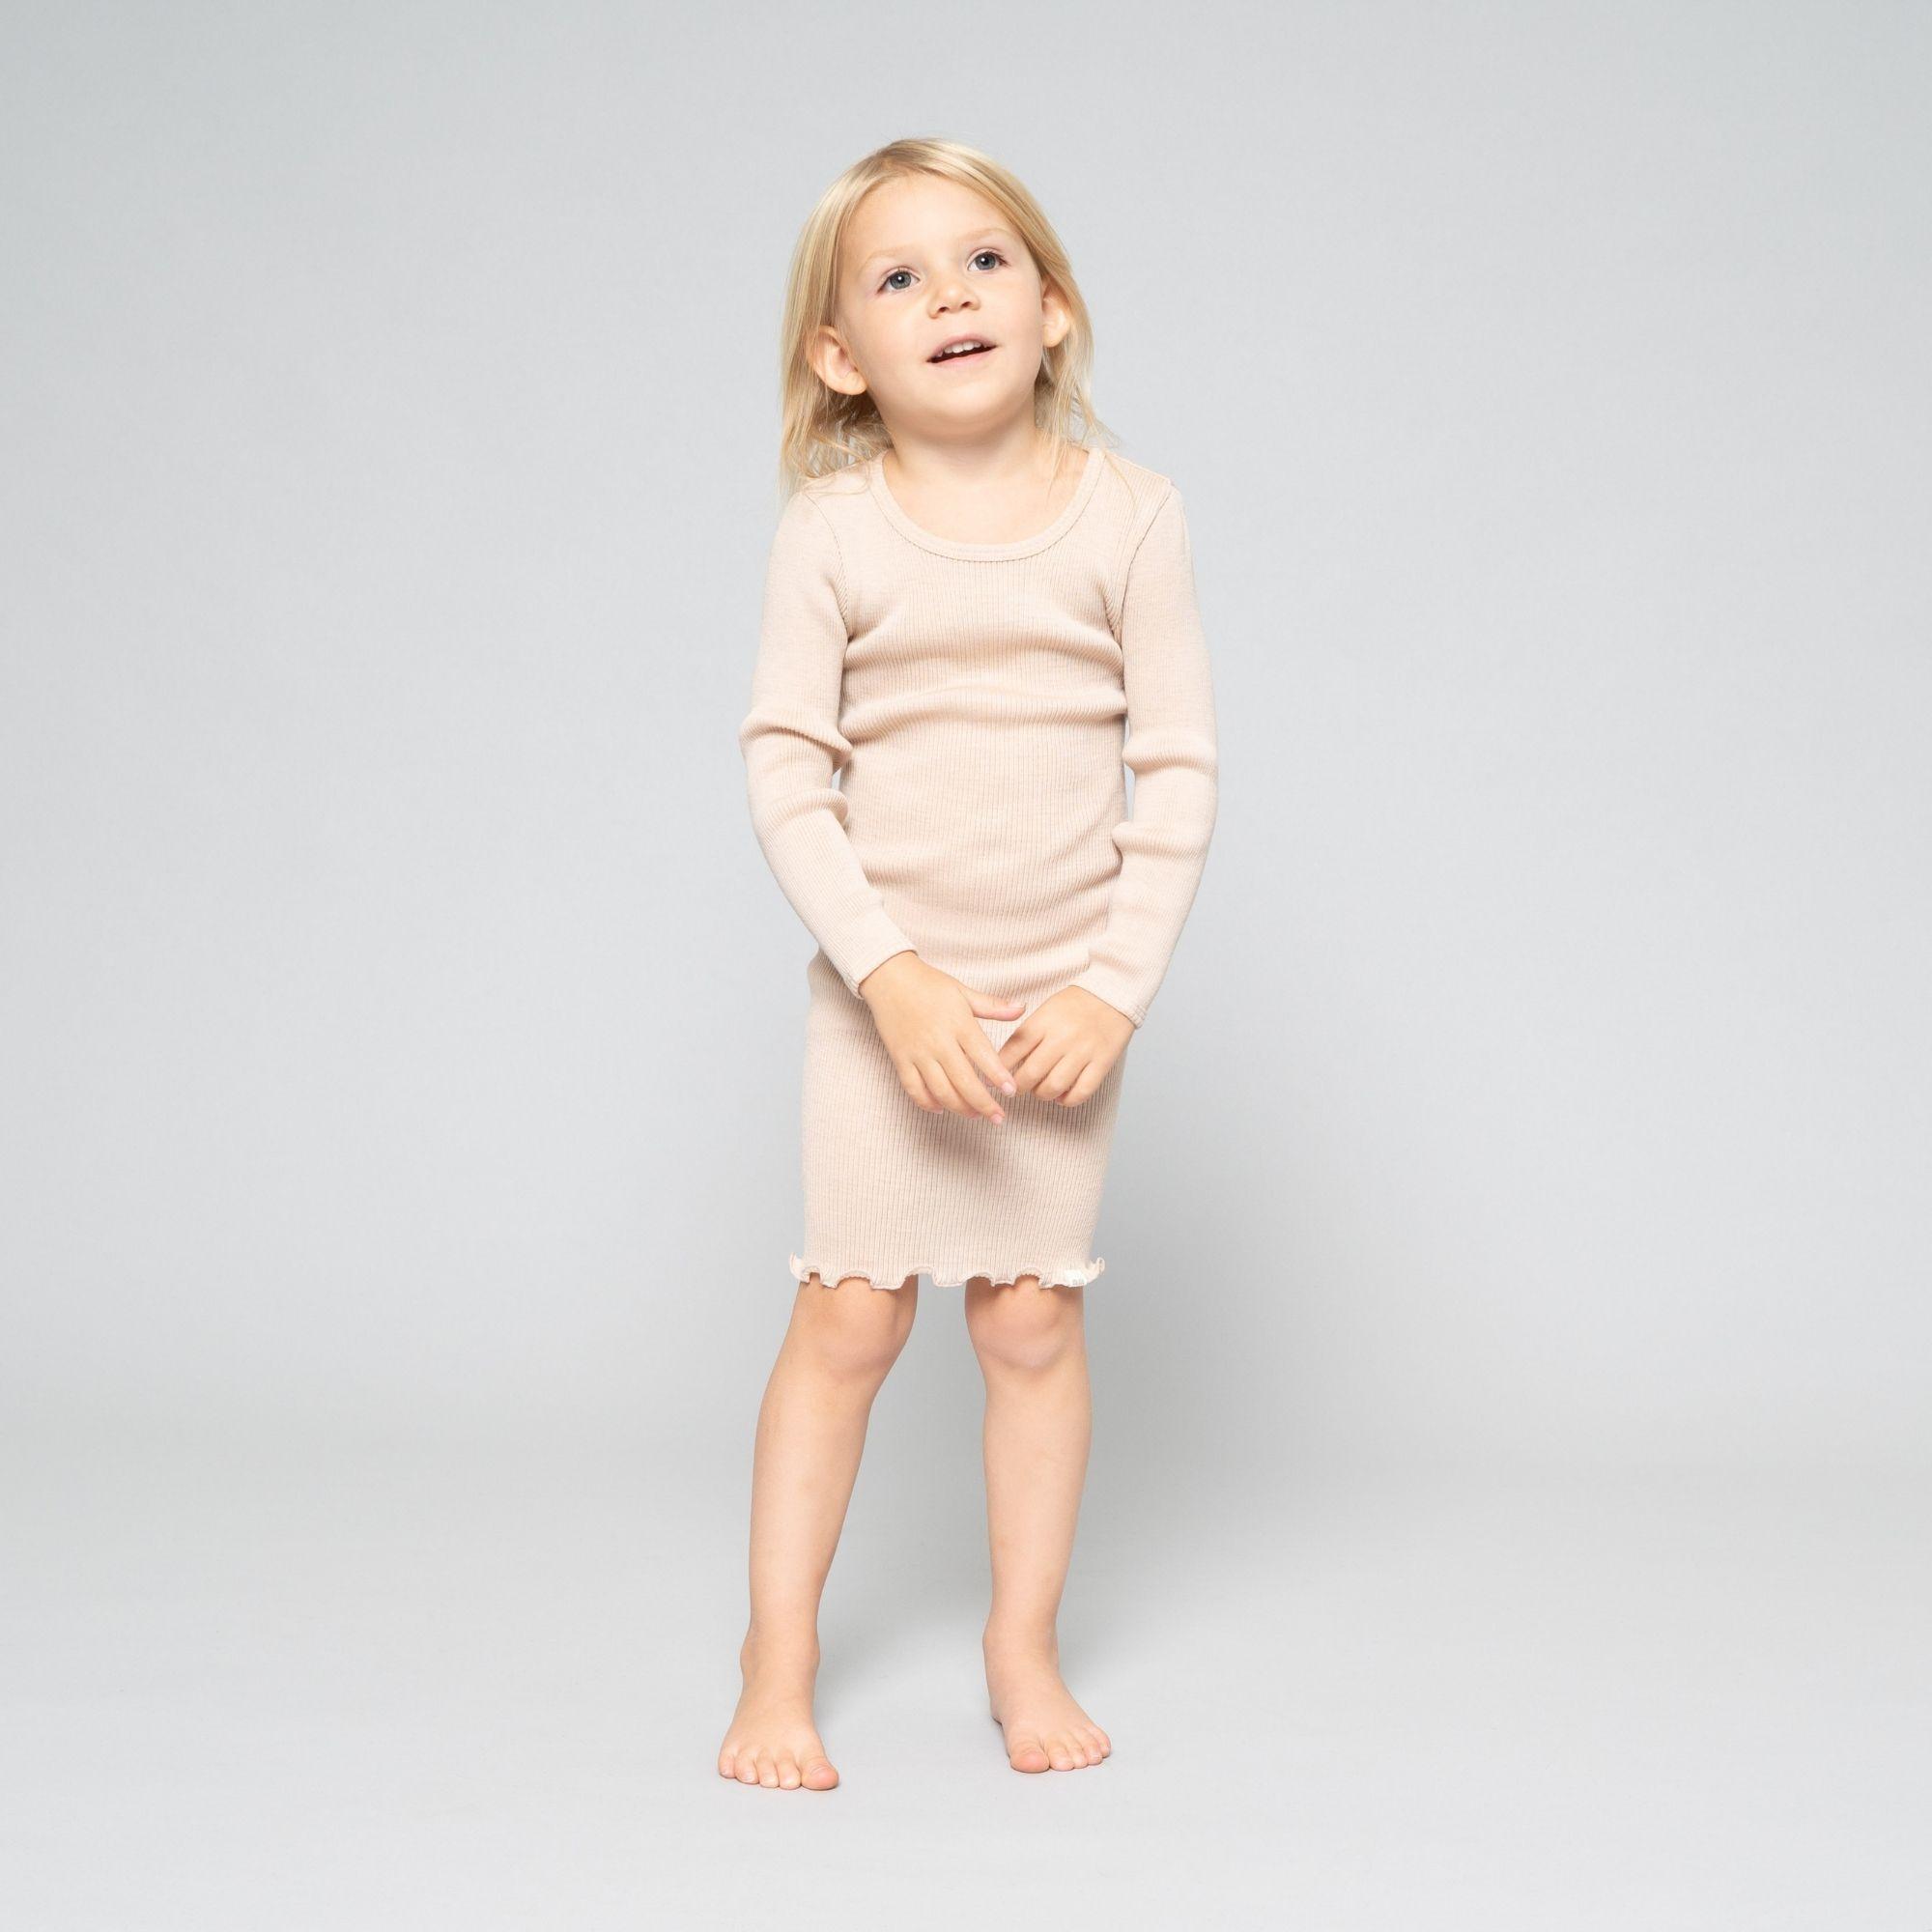 robe-manches-longues-enfant-pure-laine-merinos-minimalisma-maison-de-mamoulia-alda-sand-sable-beige---